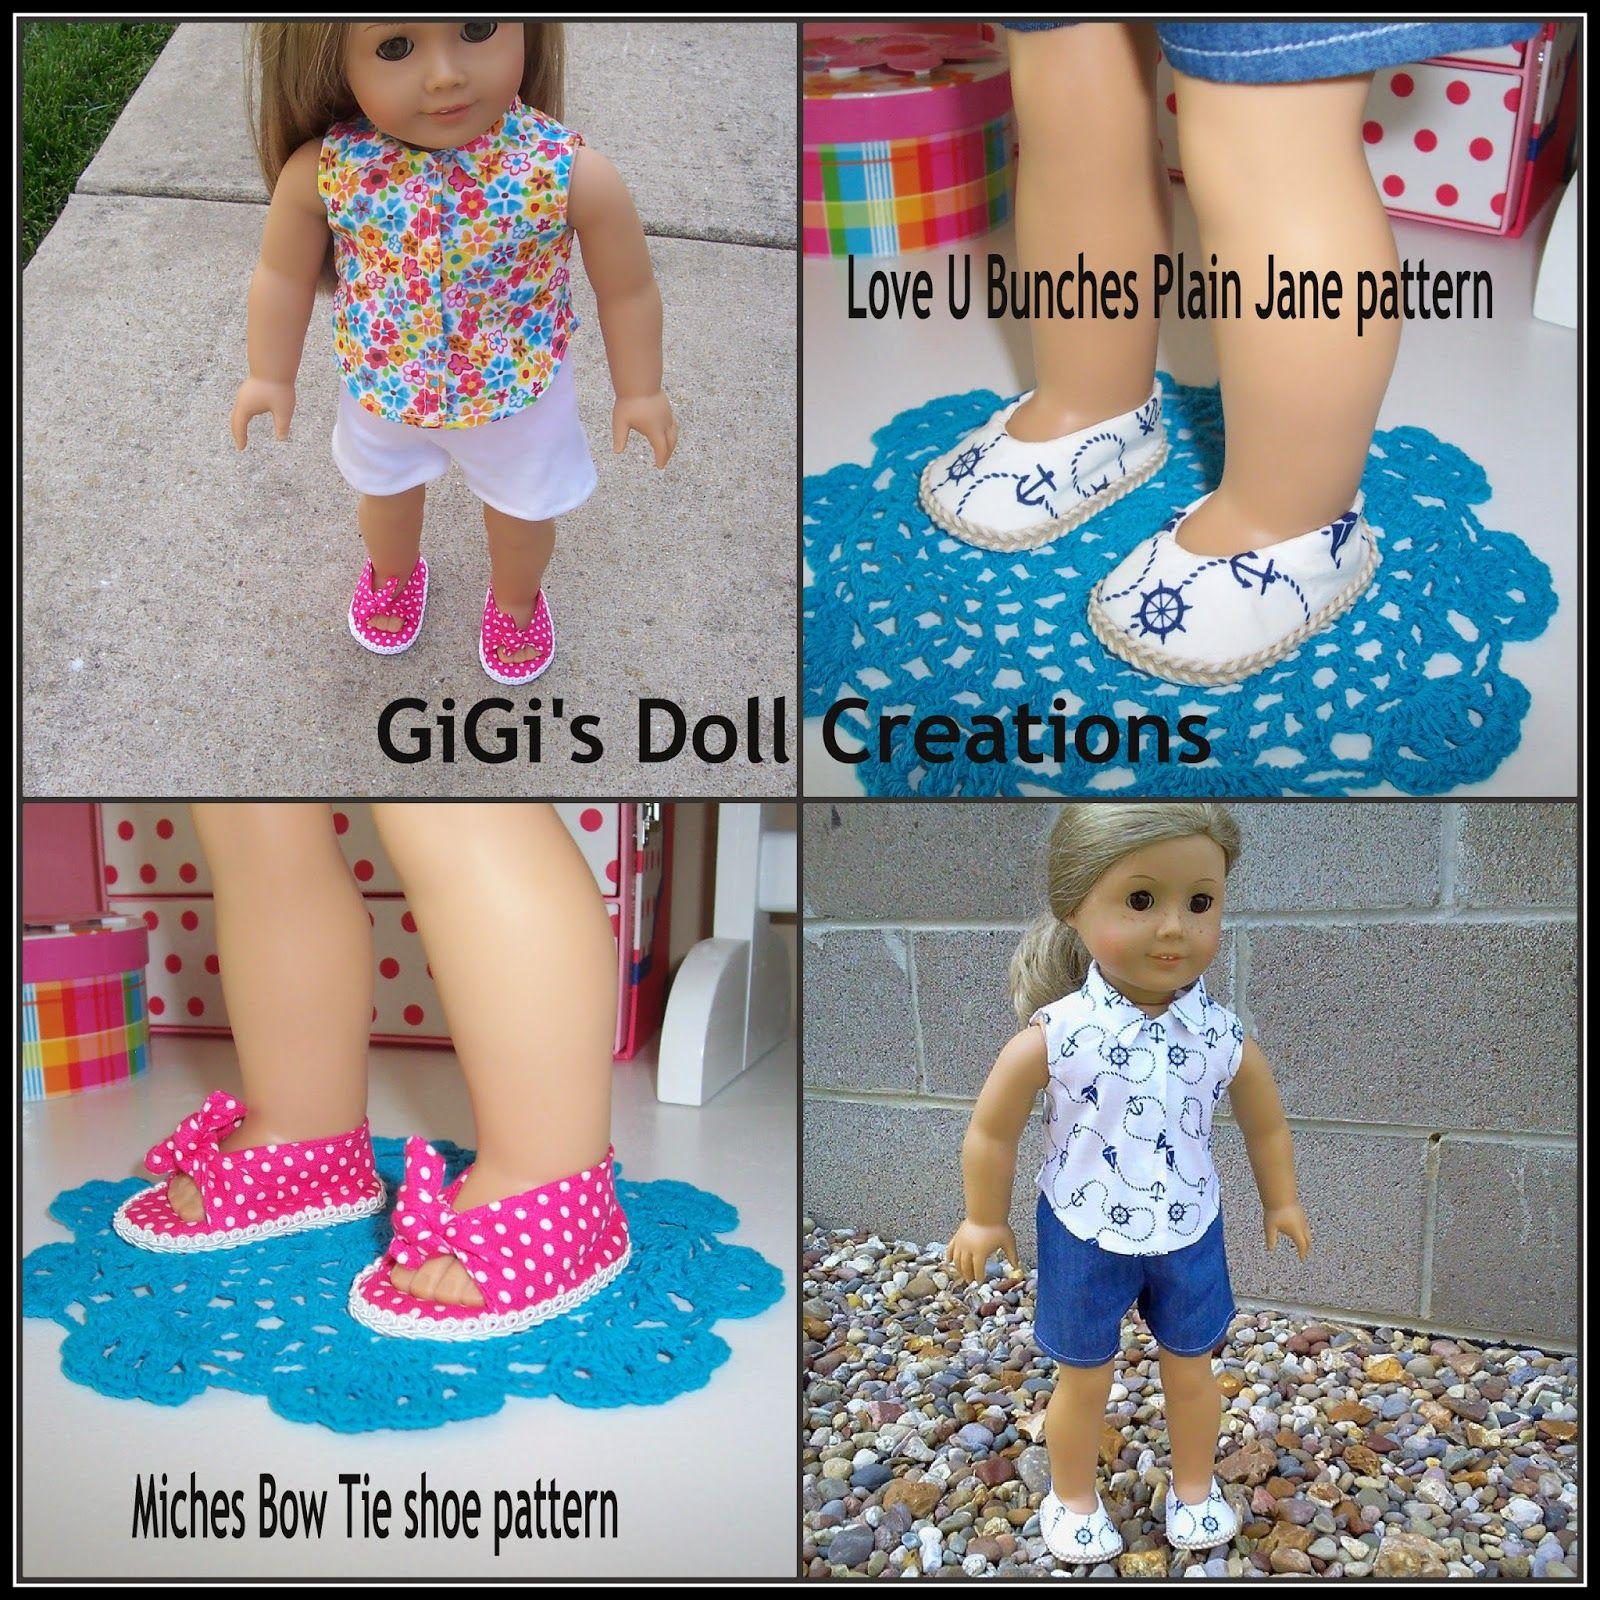 2.bp.blogspot.com -iaa9L0W3GAI U4FXngi3t_I AAAAAAAACls LMM7C0GXmd8 s1600 Collage+-+shoes.jpg